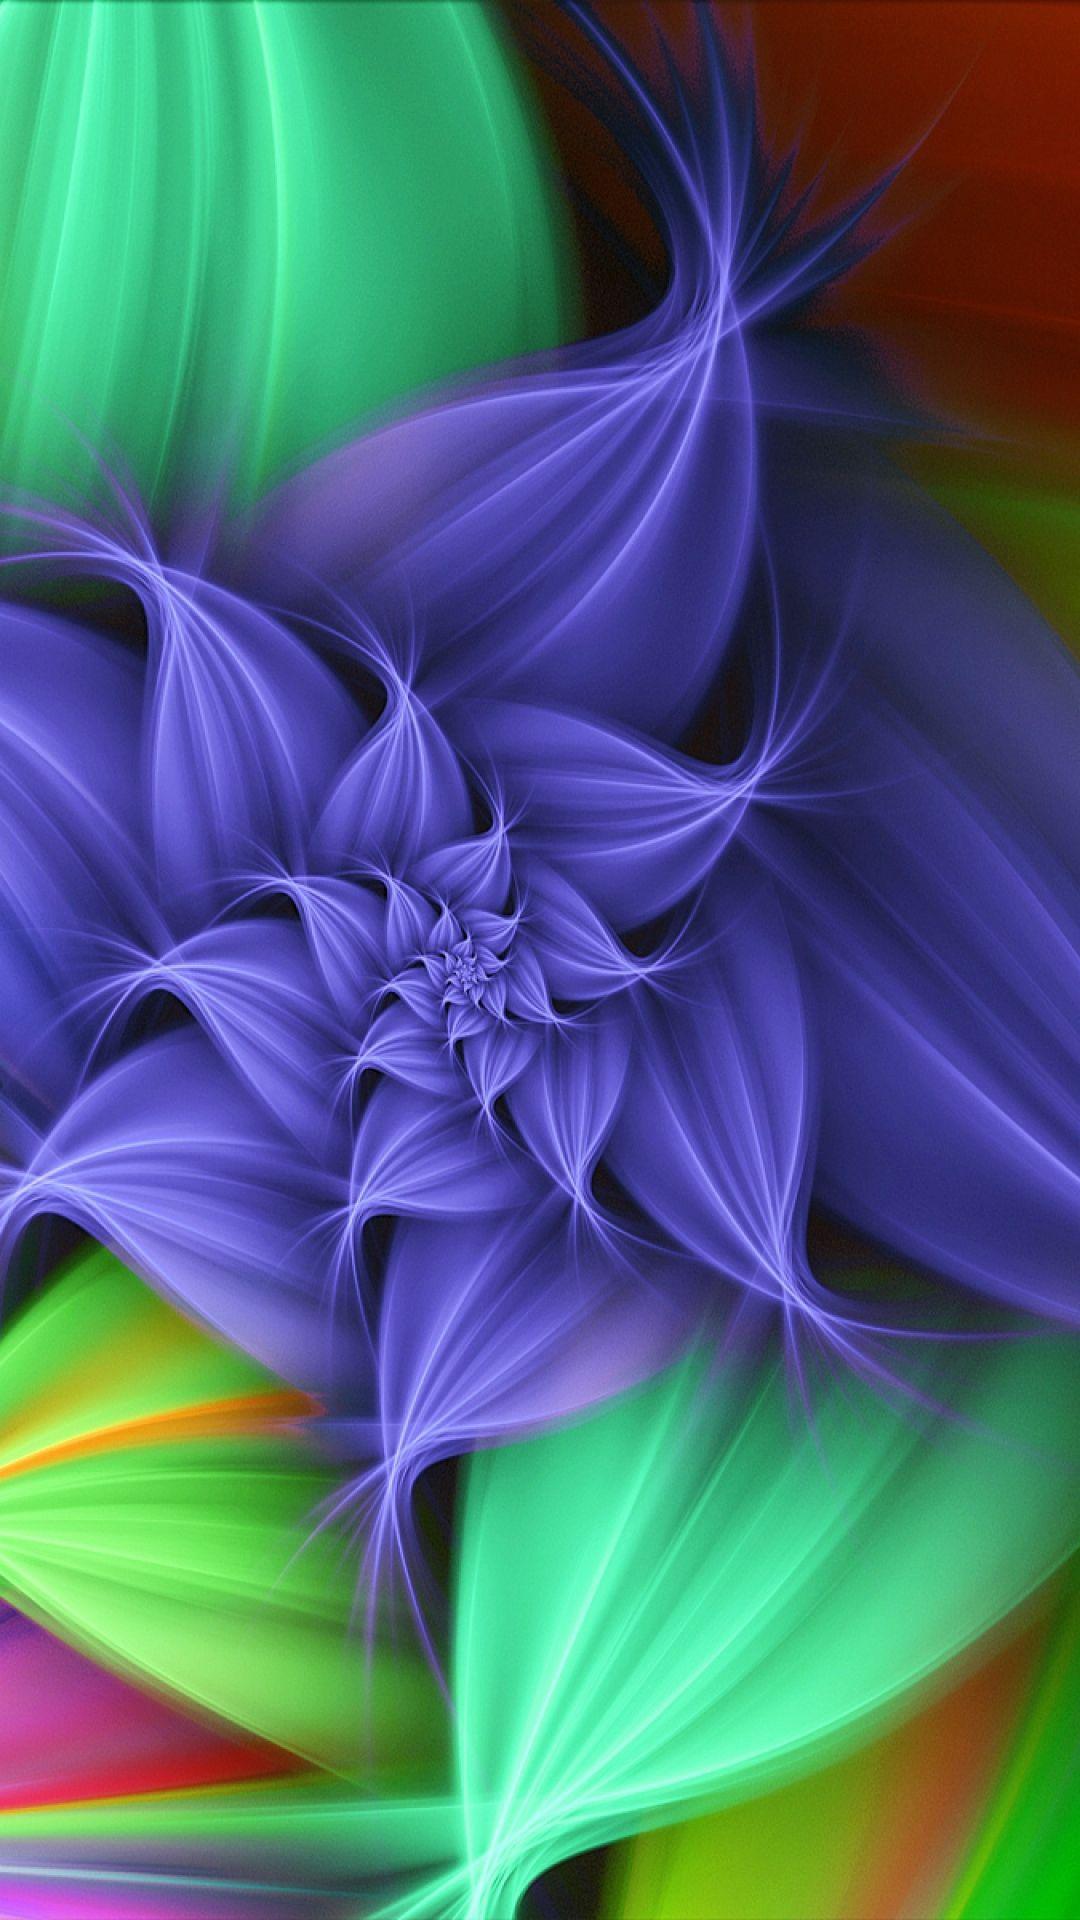 colorful, bright, background, patterns Fractal art